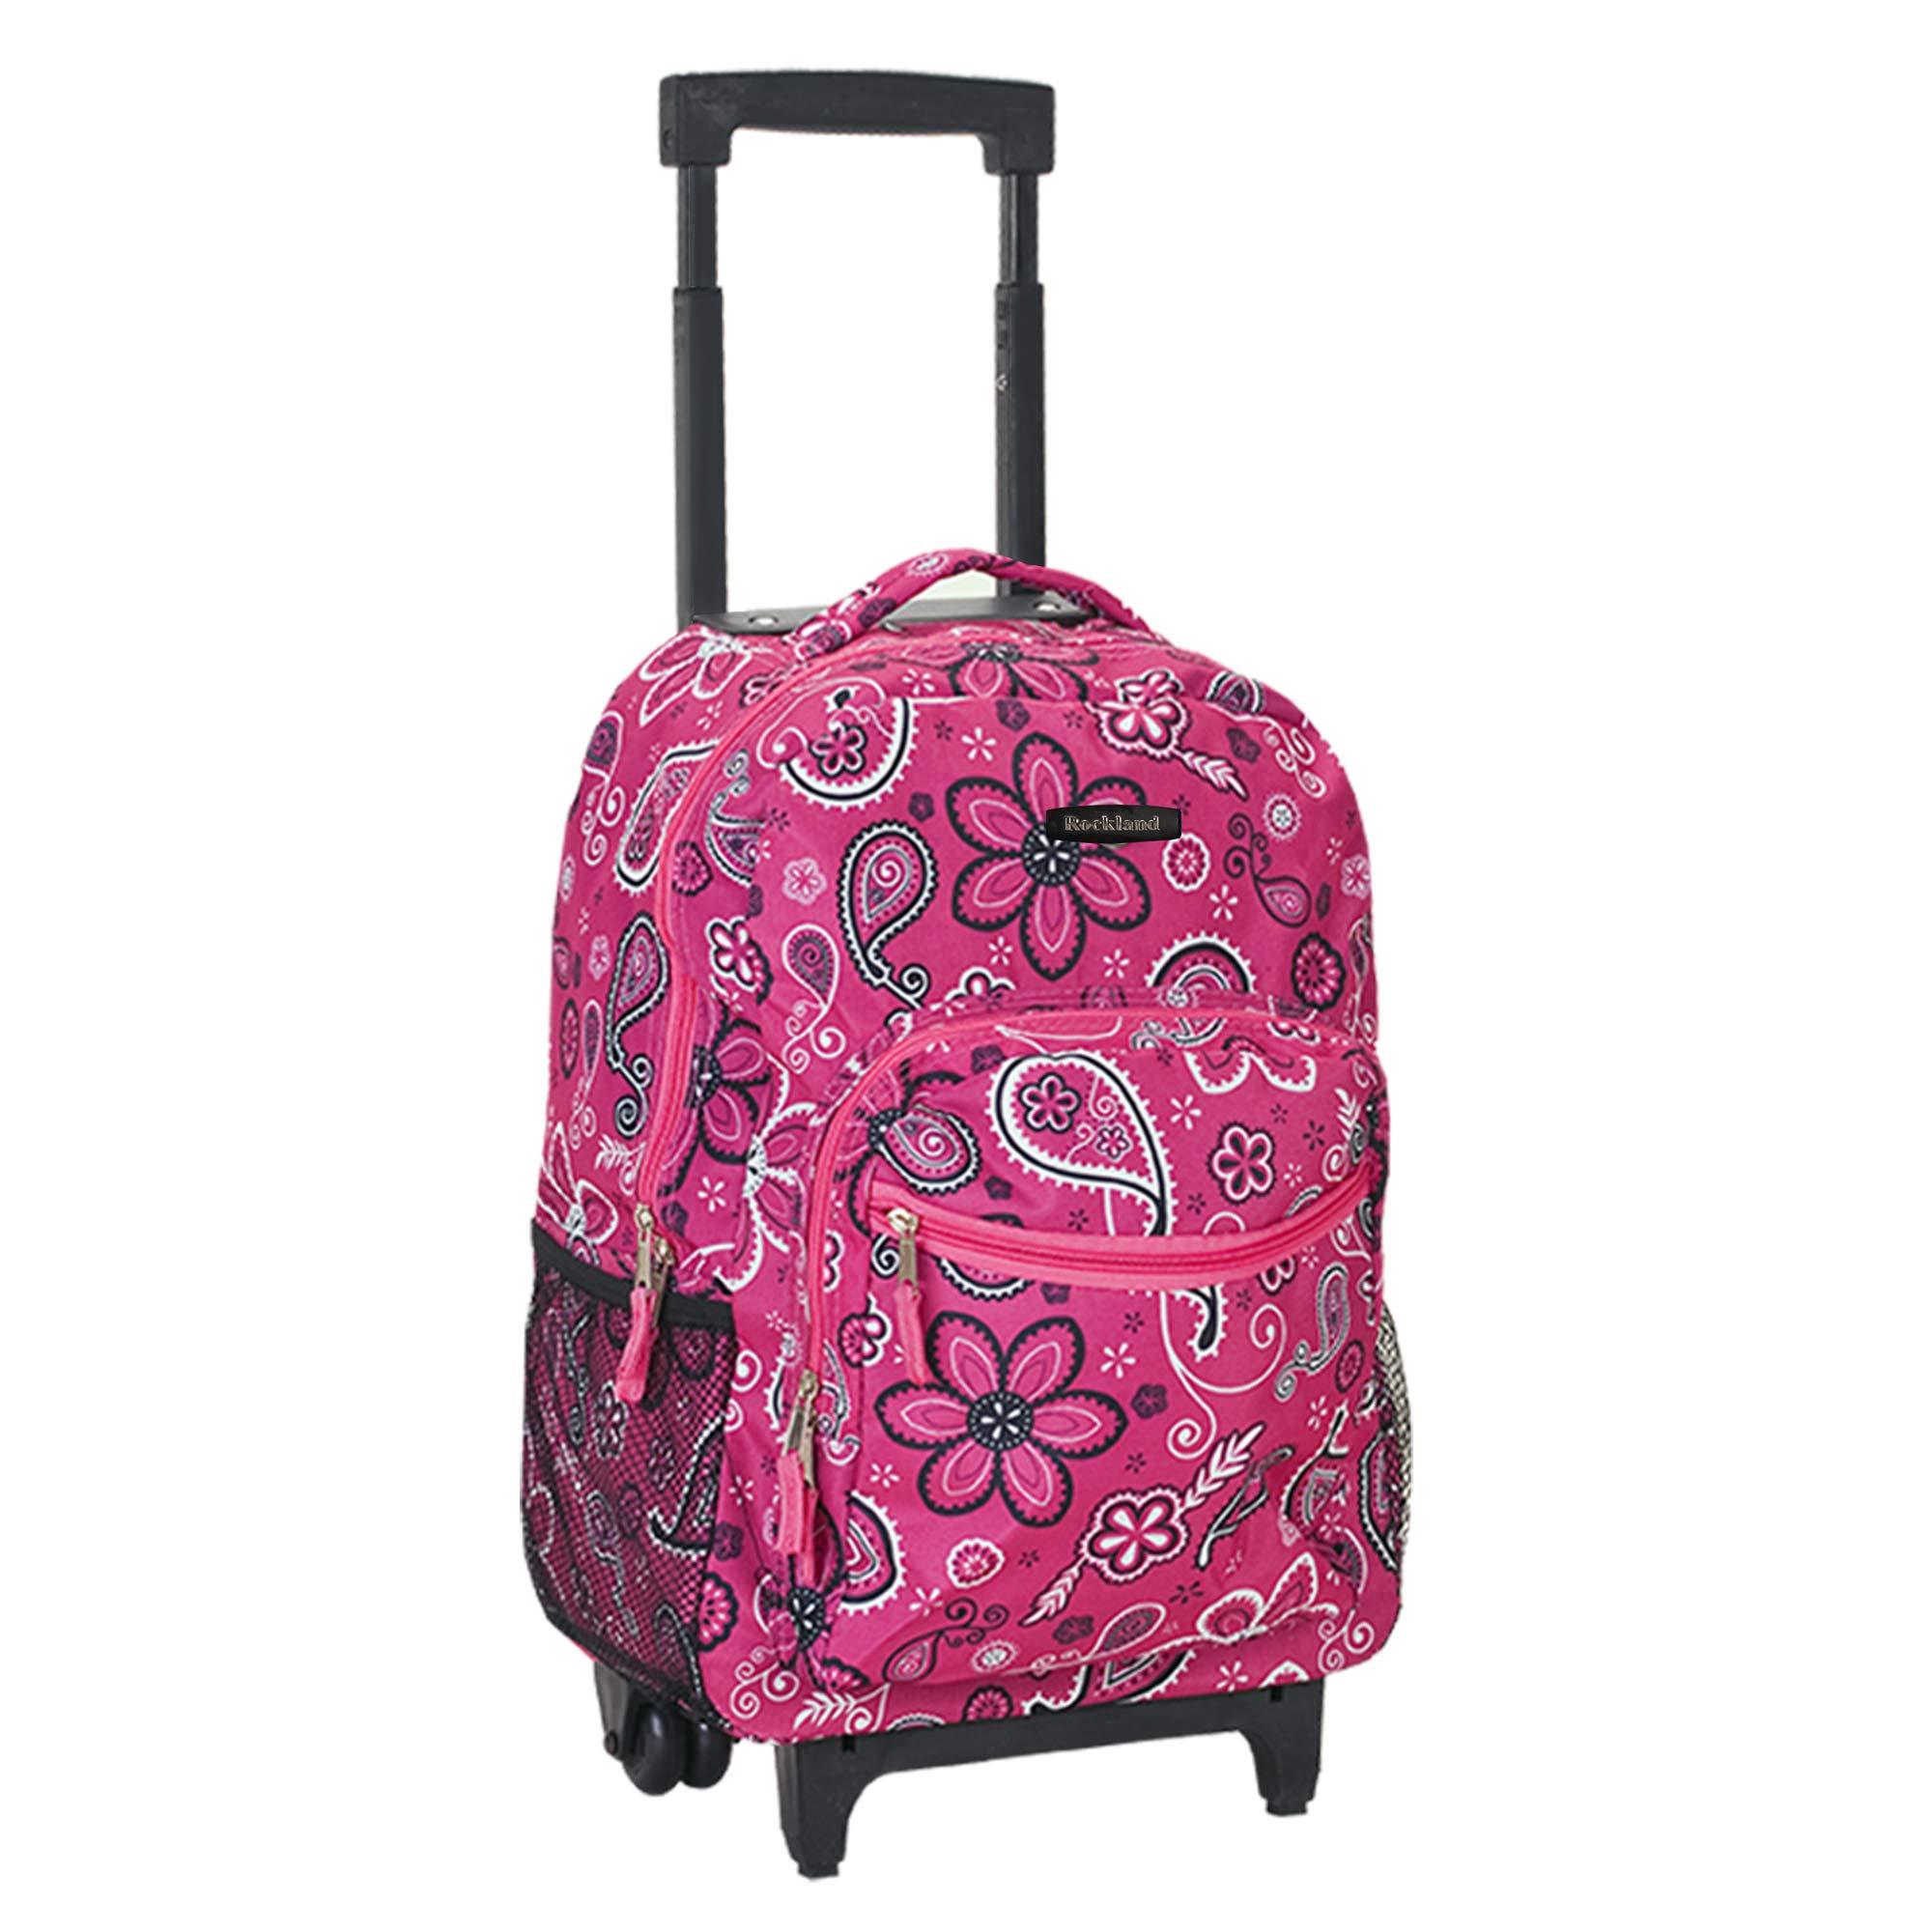 Rockland Luggage 17 Inch Rolling Backpack, Bandana, Medium by Rockland